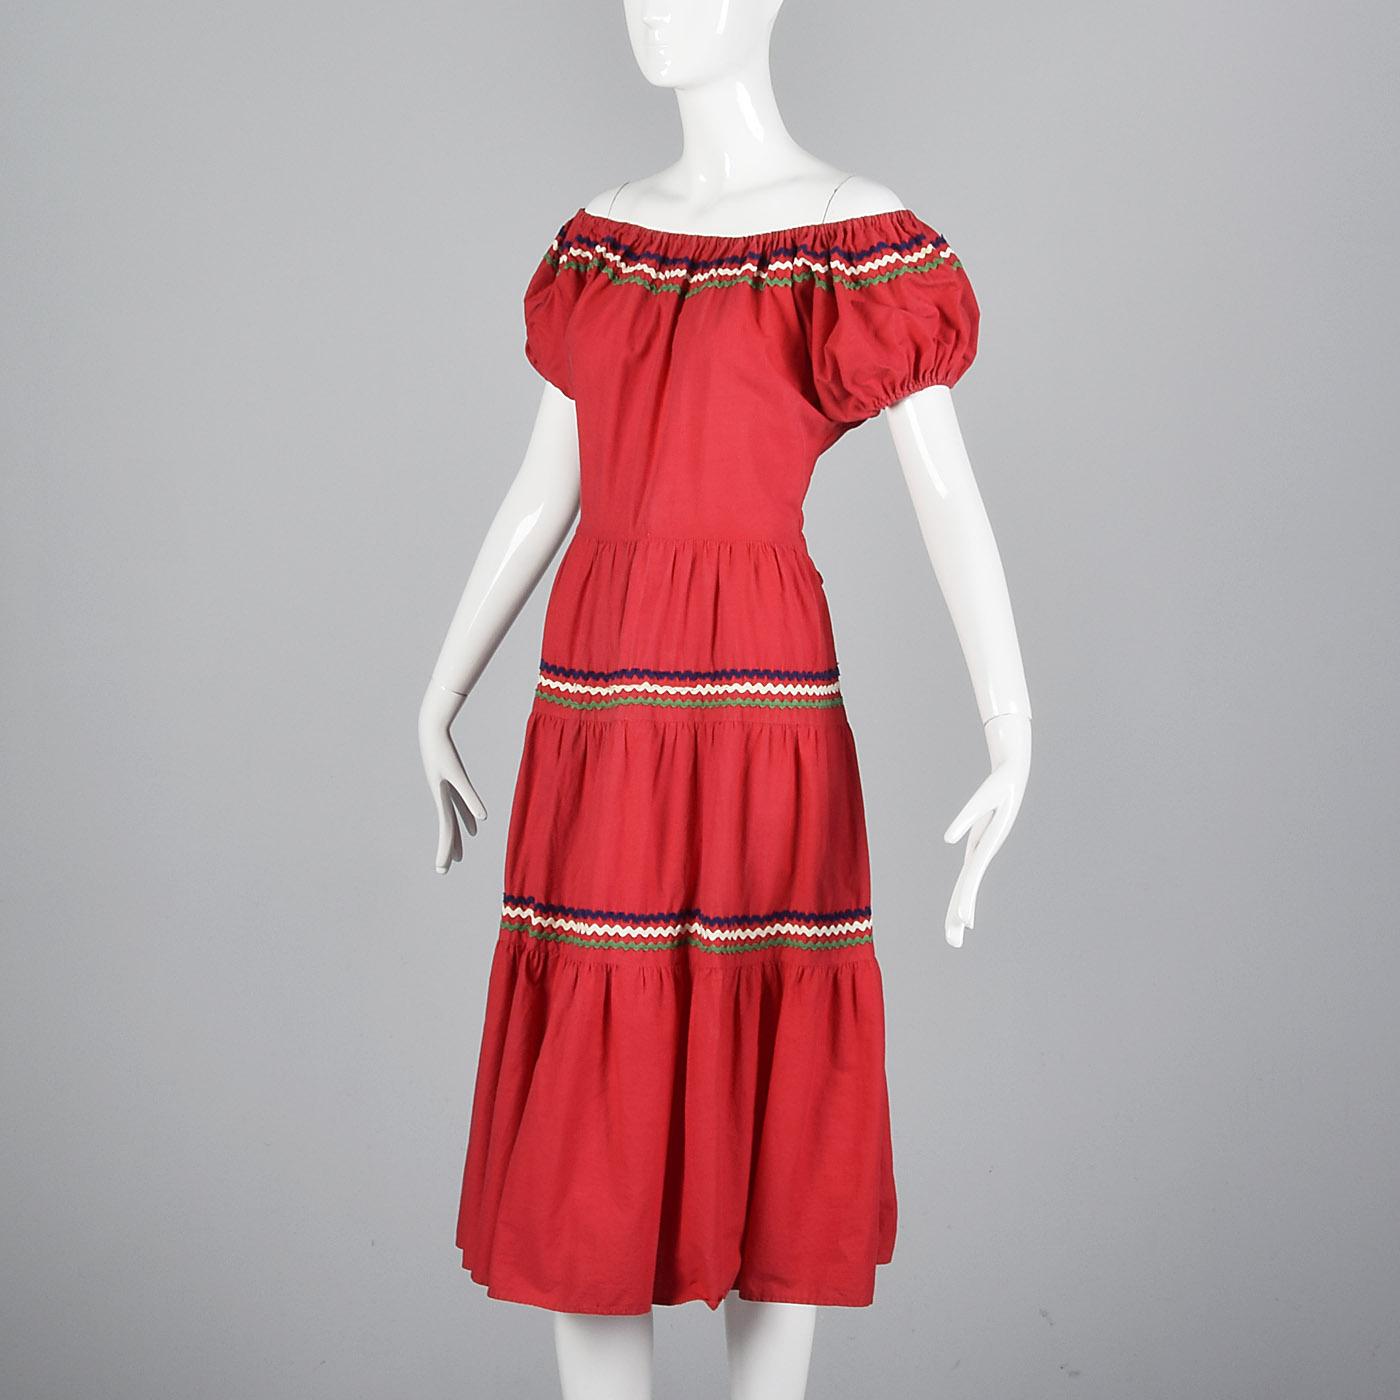 Medium 1950s Bohemian Off Shoulder Dress Red Cotton Summer Dress Ric Rac Rockabilly Square Dance Casual Day Wear 50s Vintage